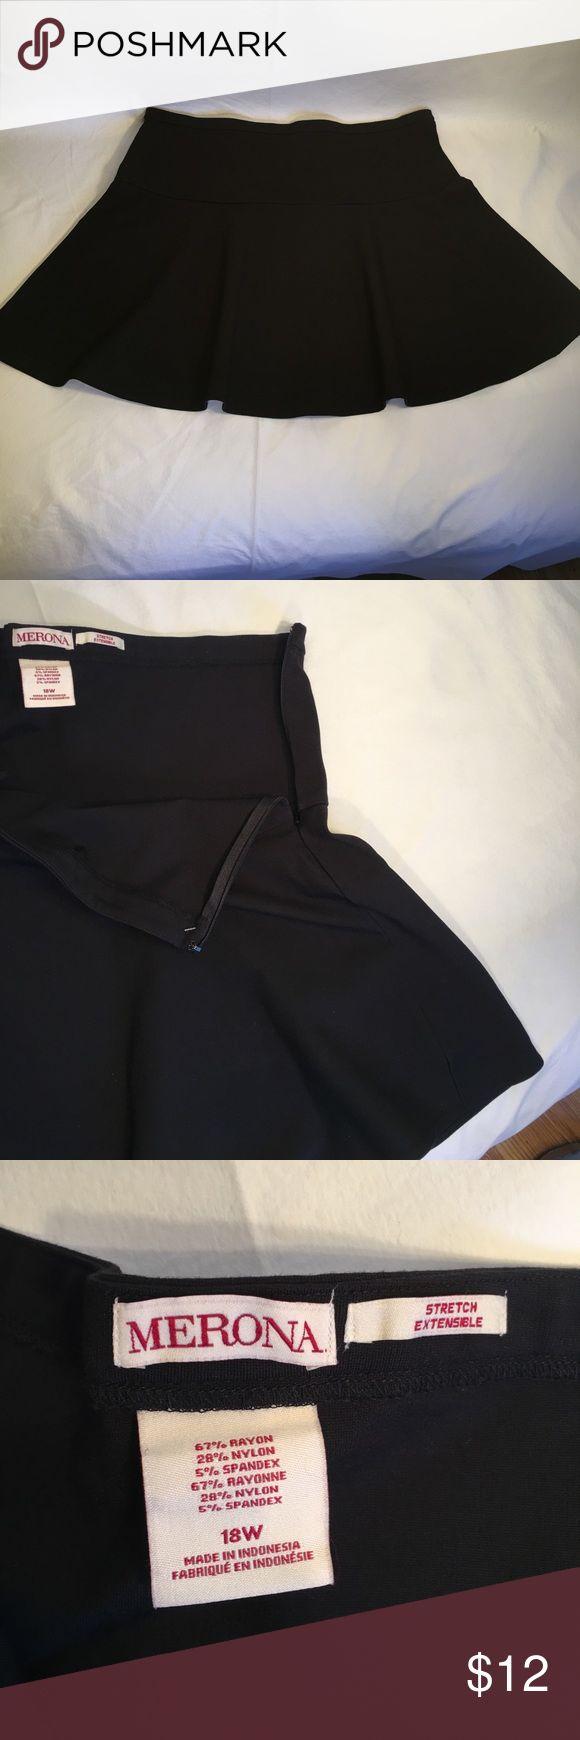 Plus size Merona black circle skirt Plus size Merona black circle skirt Worn once 19 in from waistband to bottom hem Merona Skirts Circle & Skater